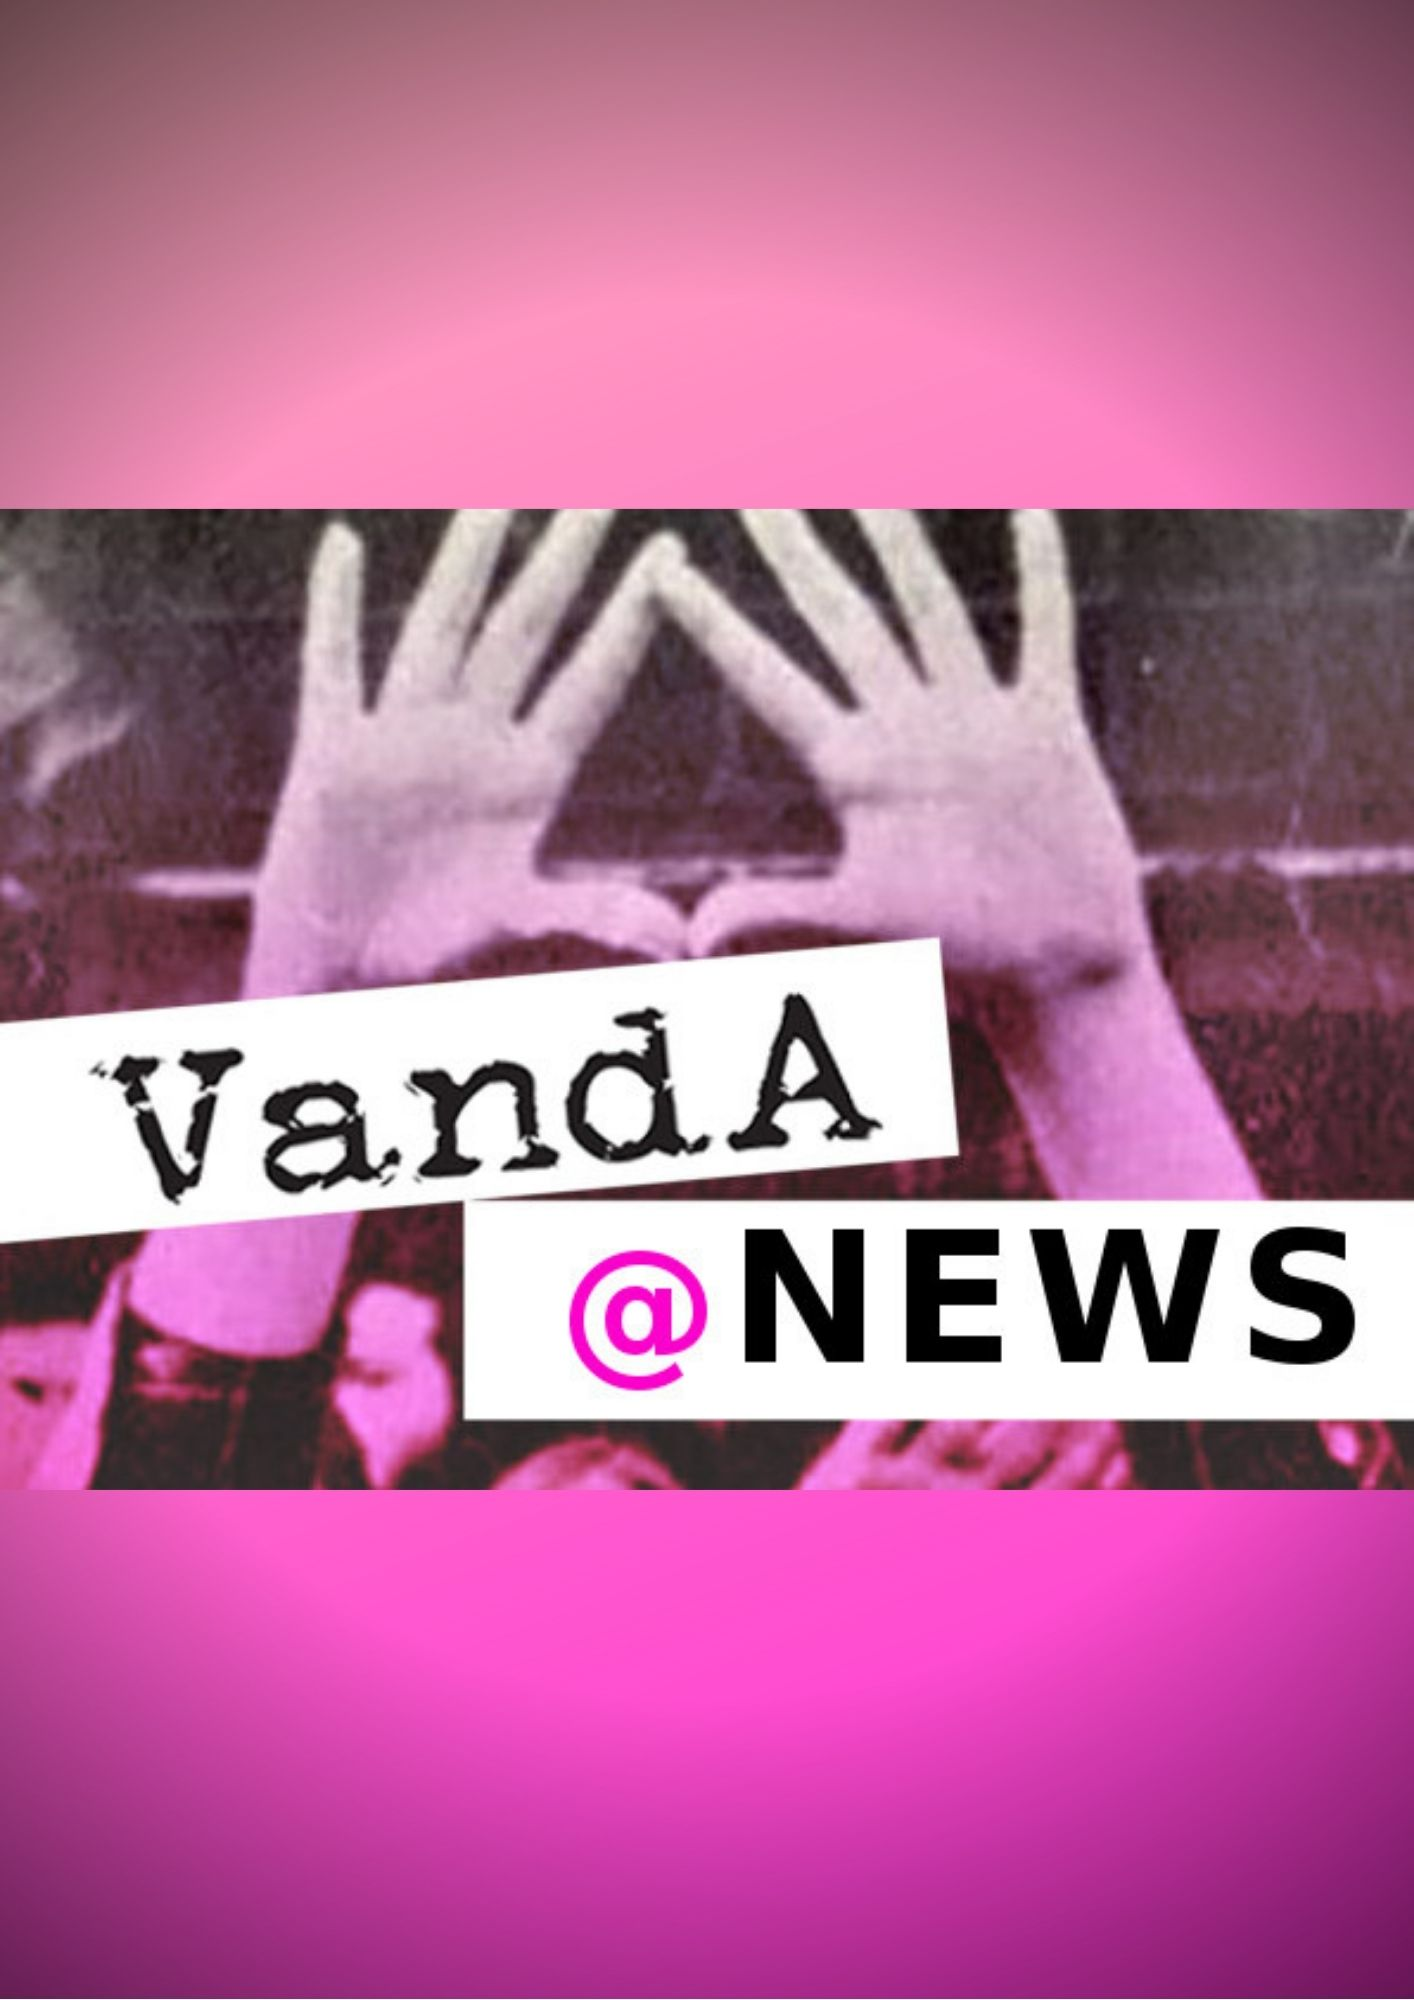 Iscriviti alla nostra newsletter VandA.NEWS